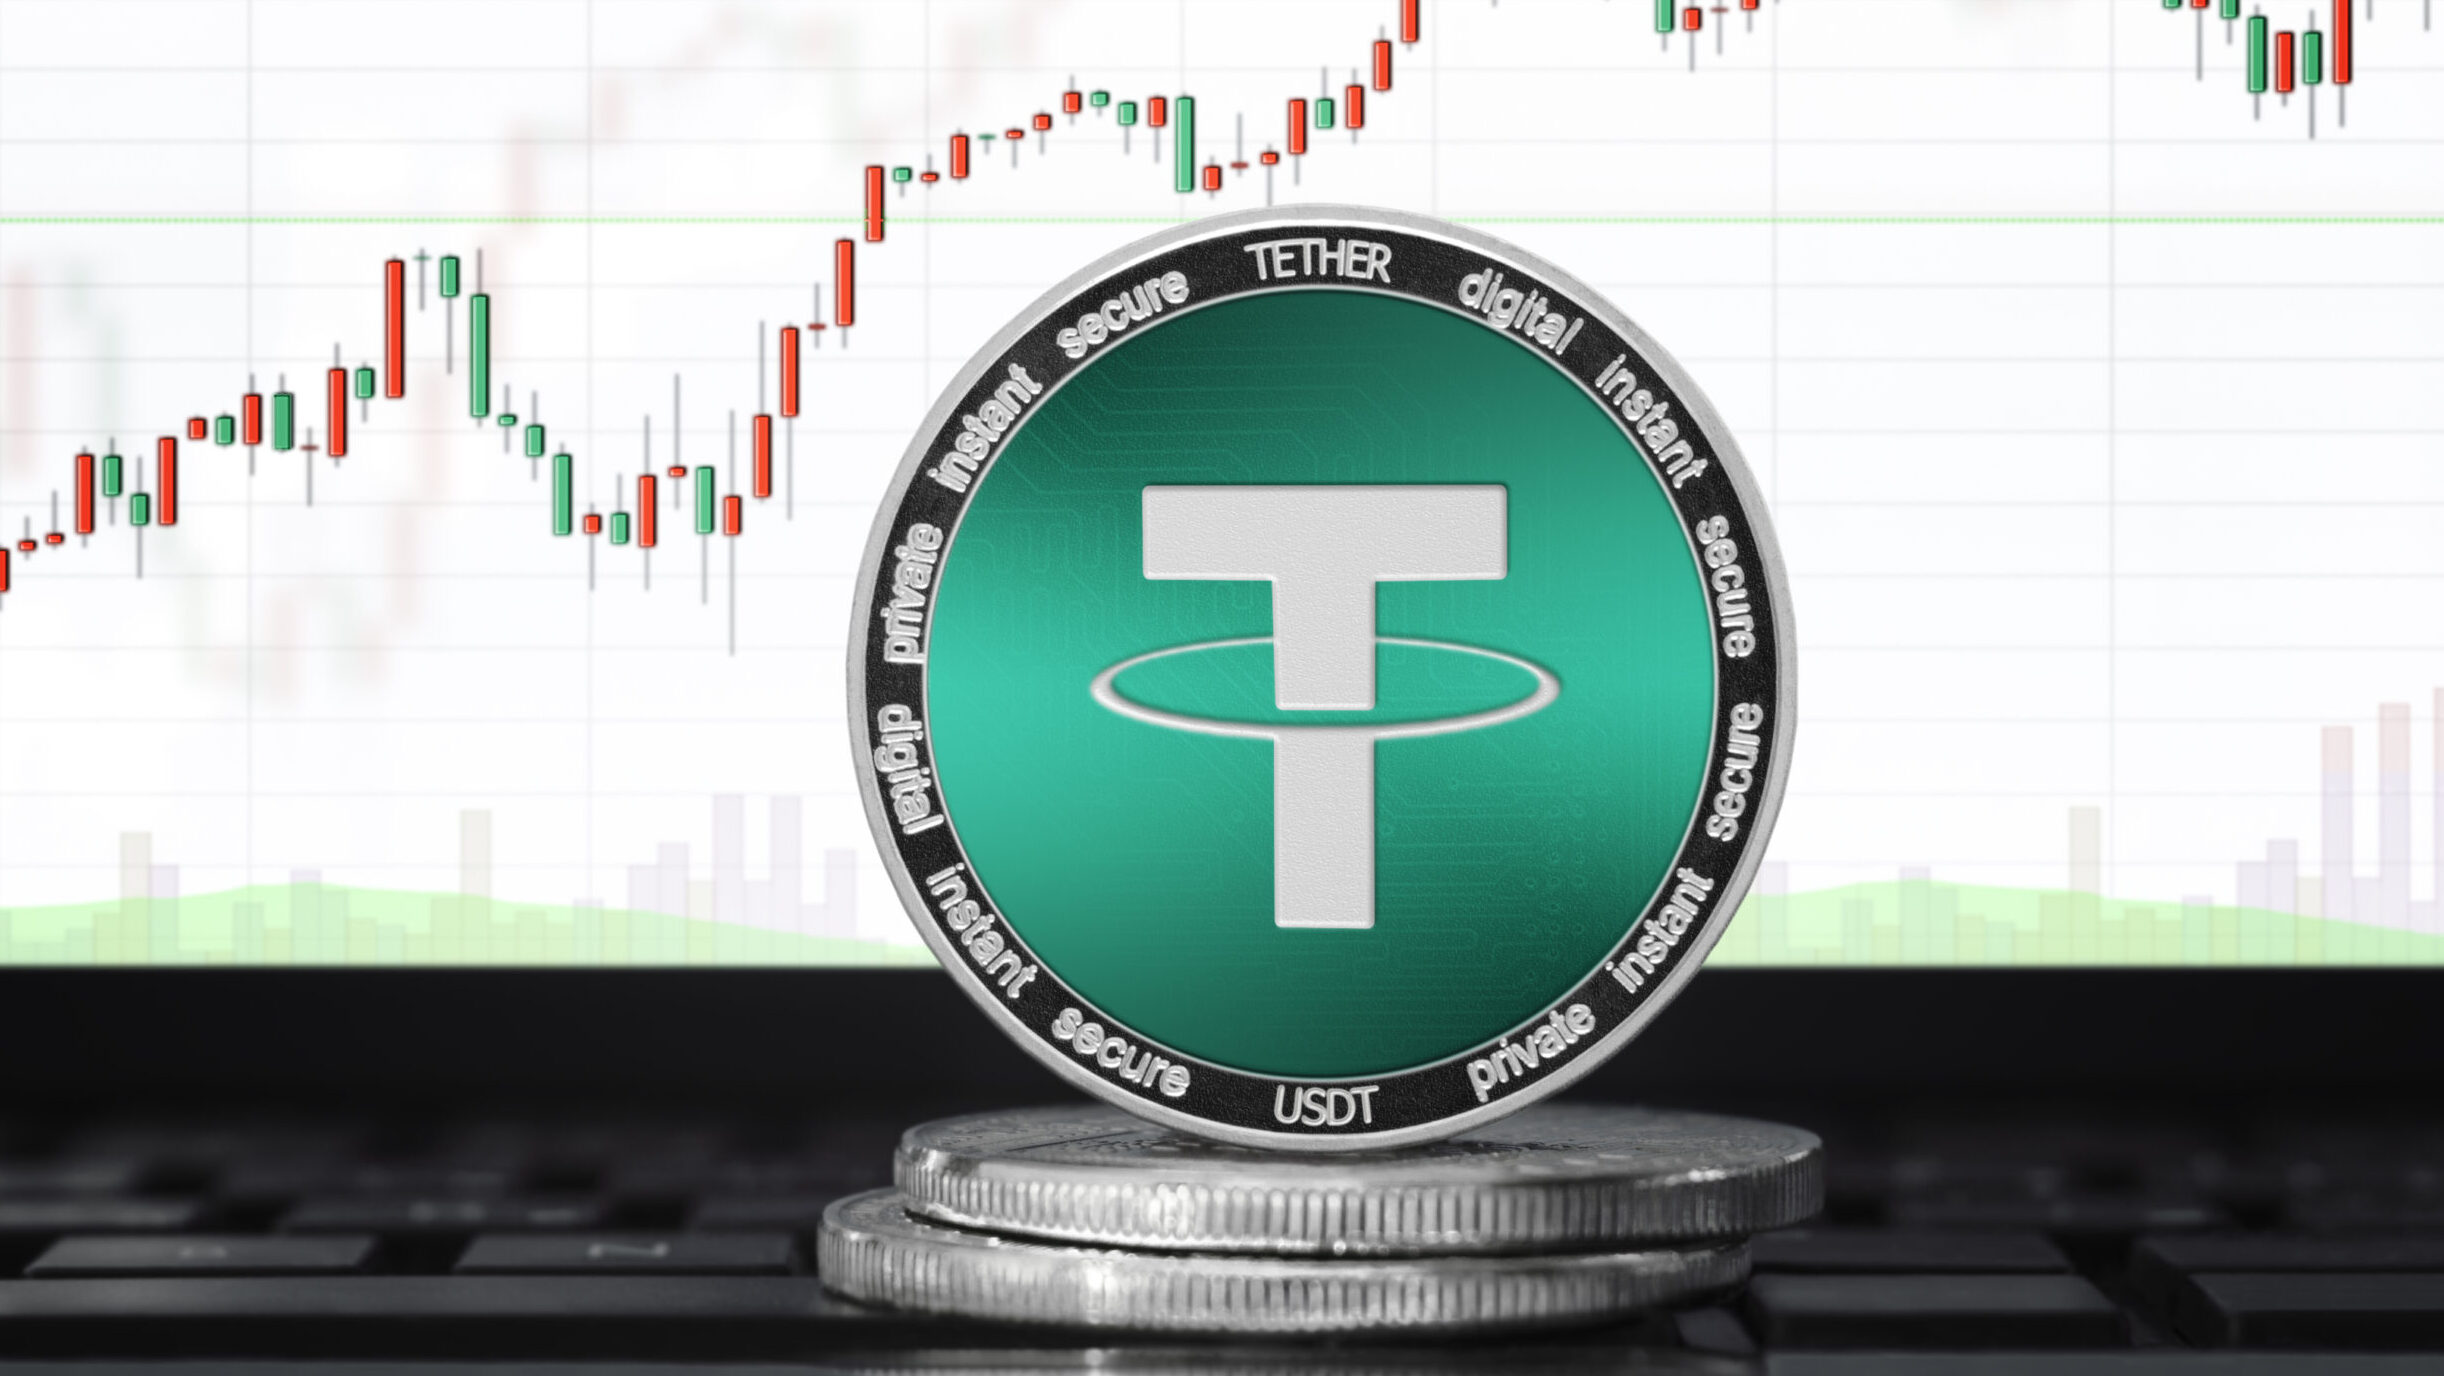 Tether market cap increases above $12 billion